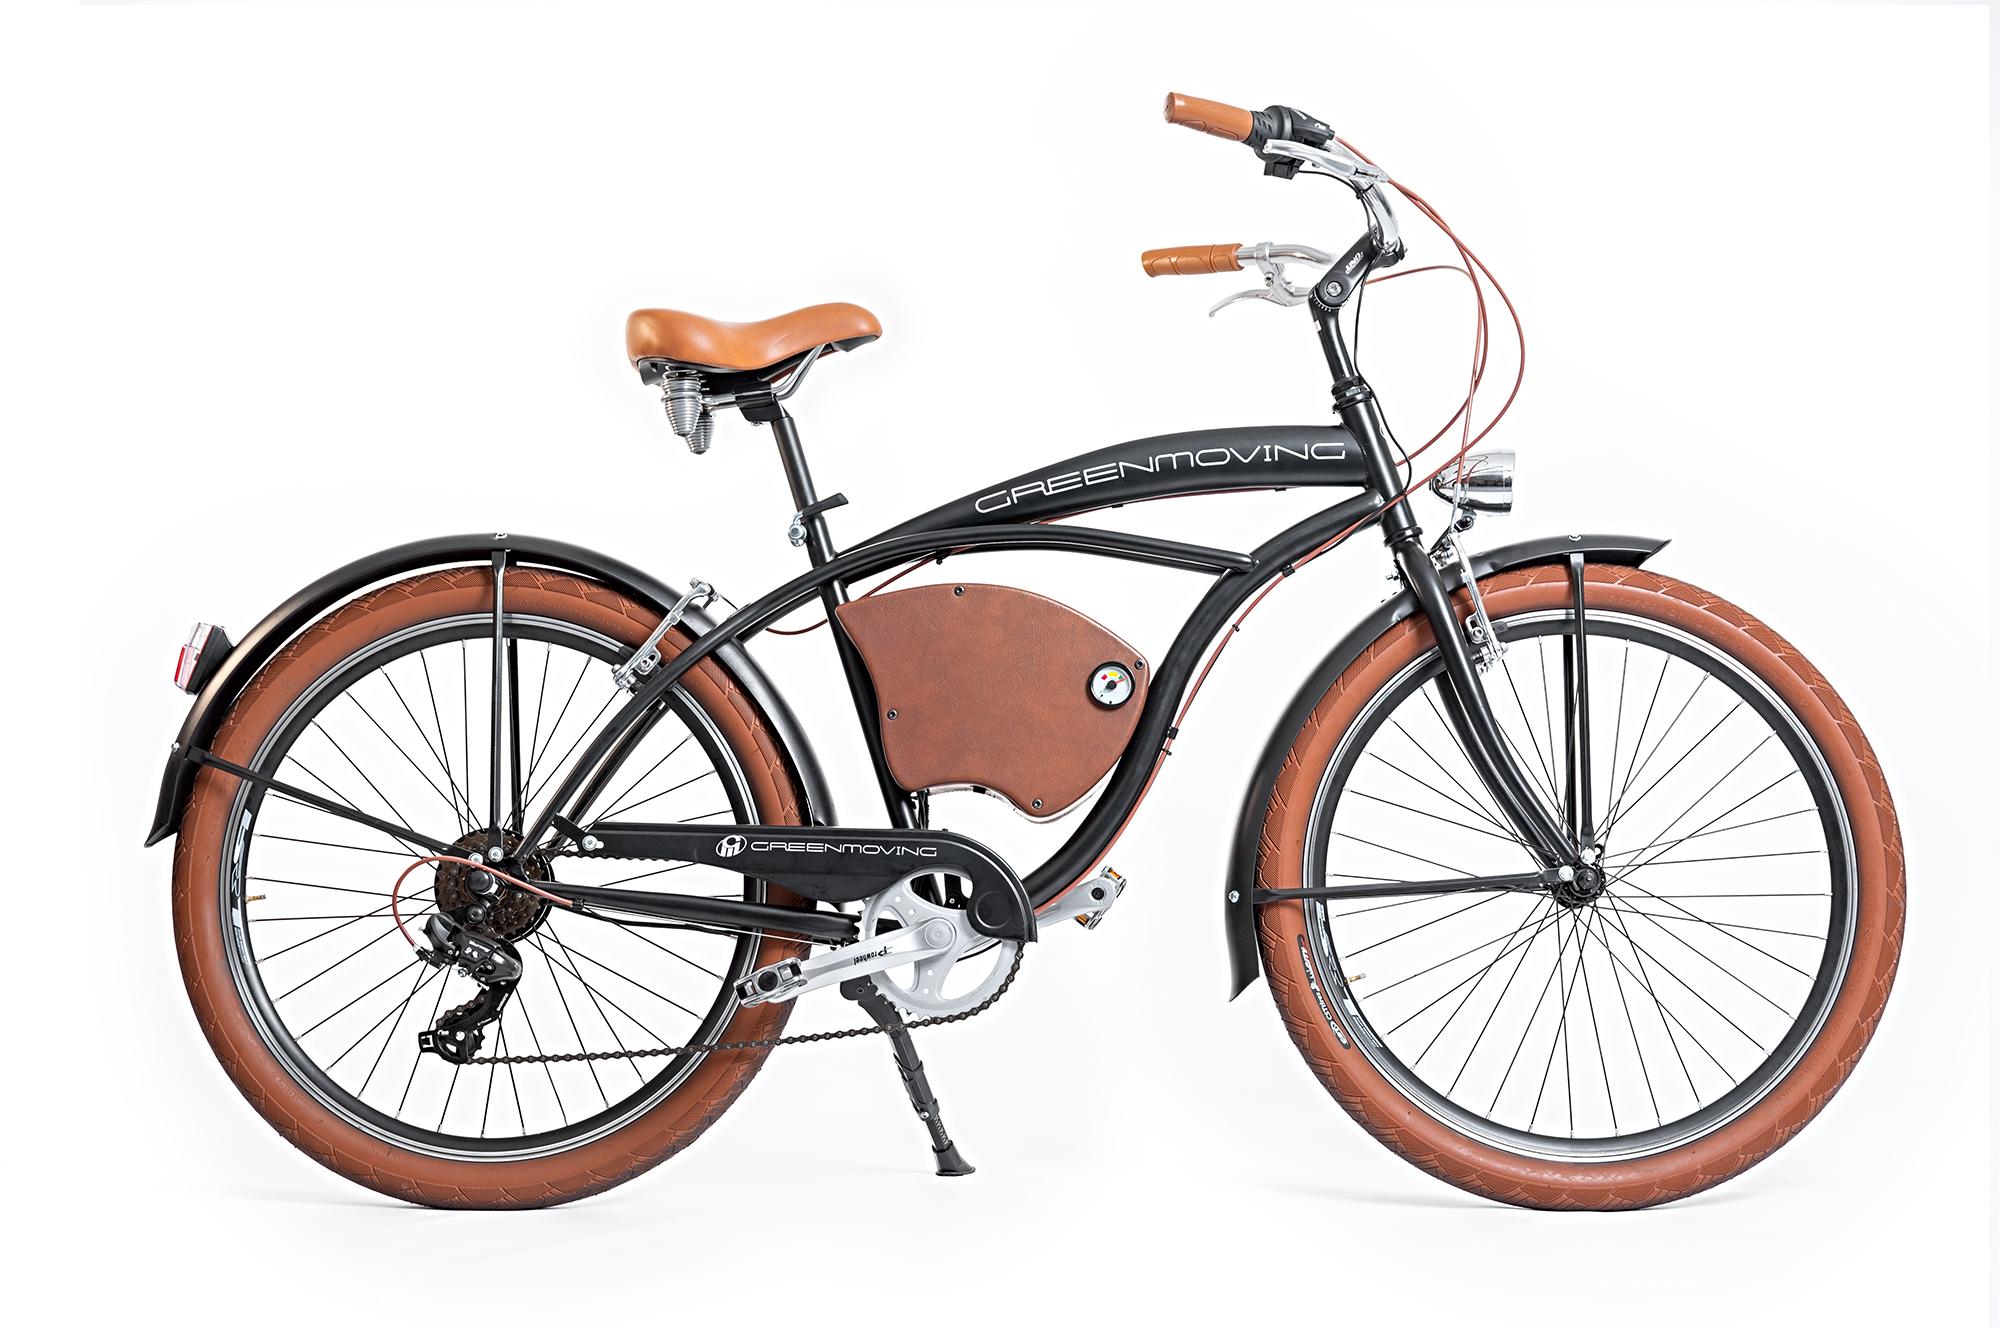 Kit Bici Elettrica Green Moving Bici Elettriche E Pedelec